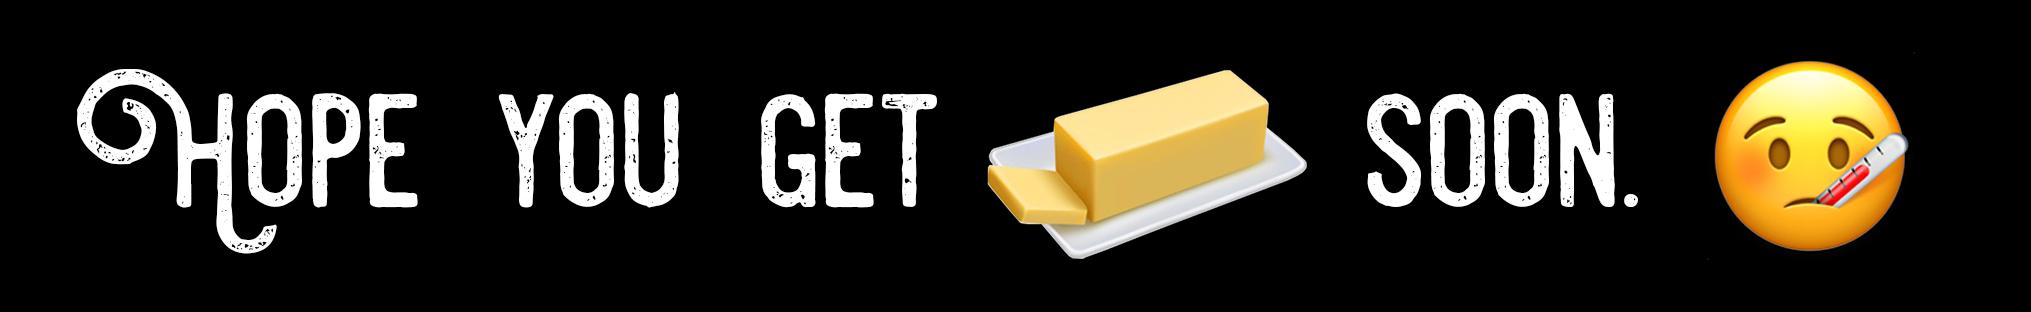 Hope You Get (Butter Emoji) Soon